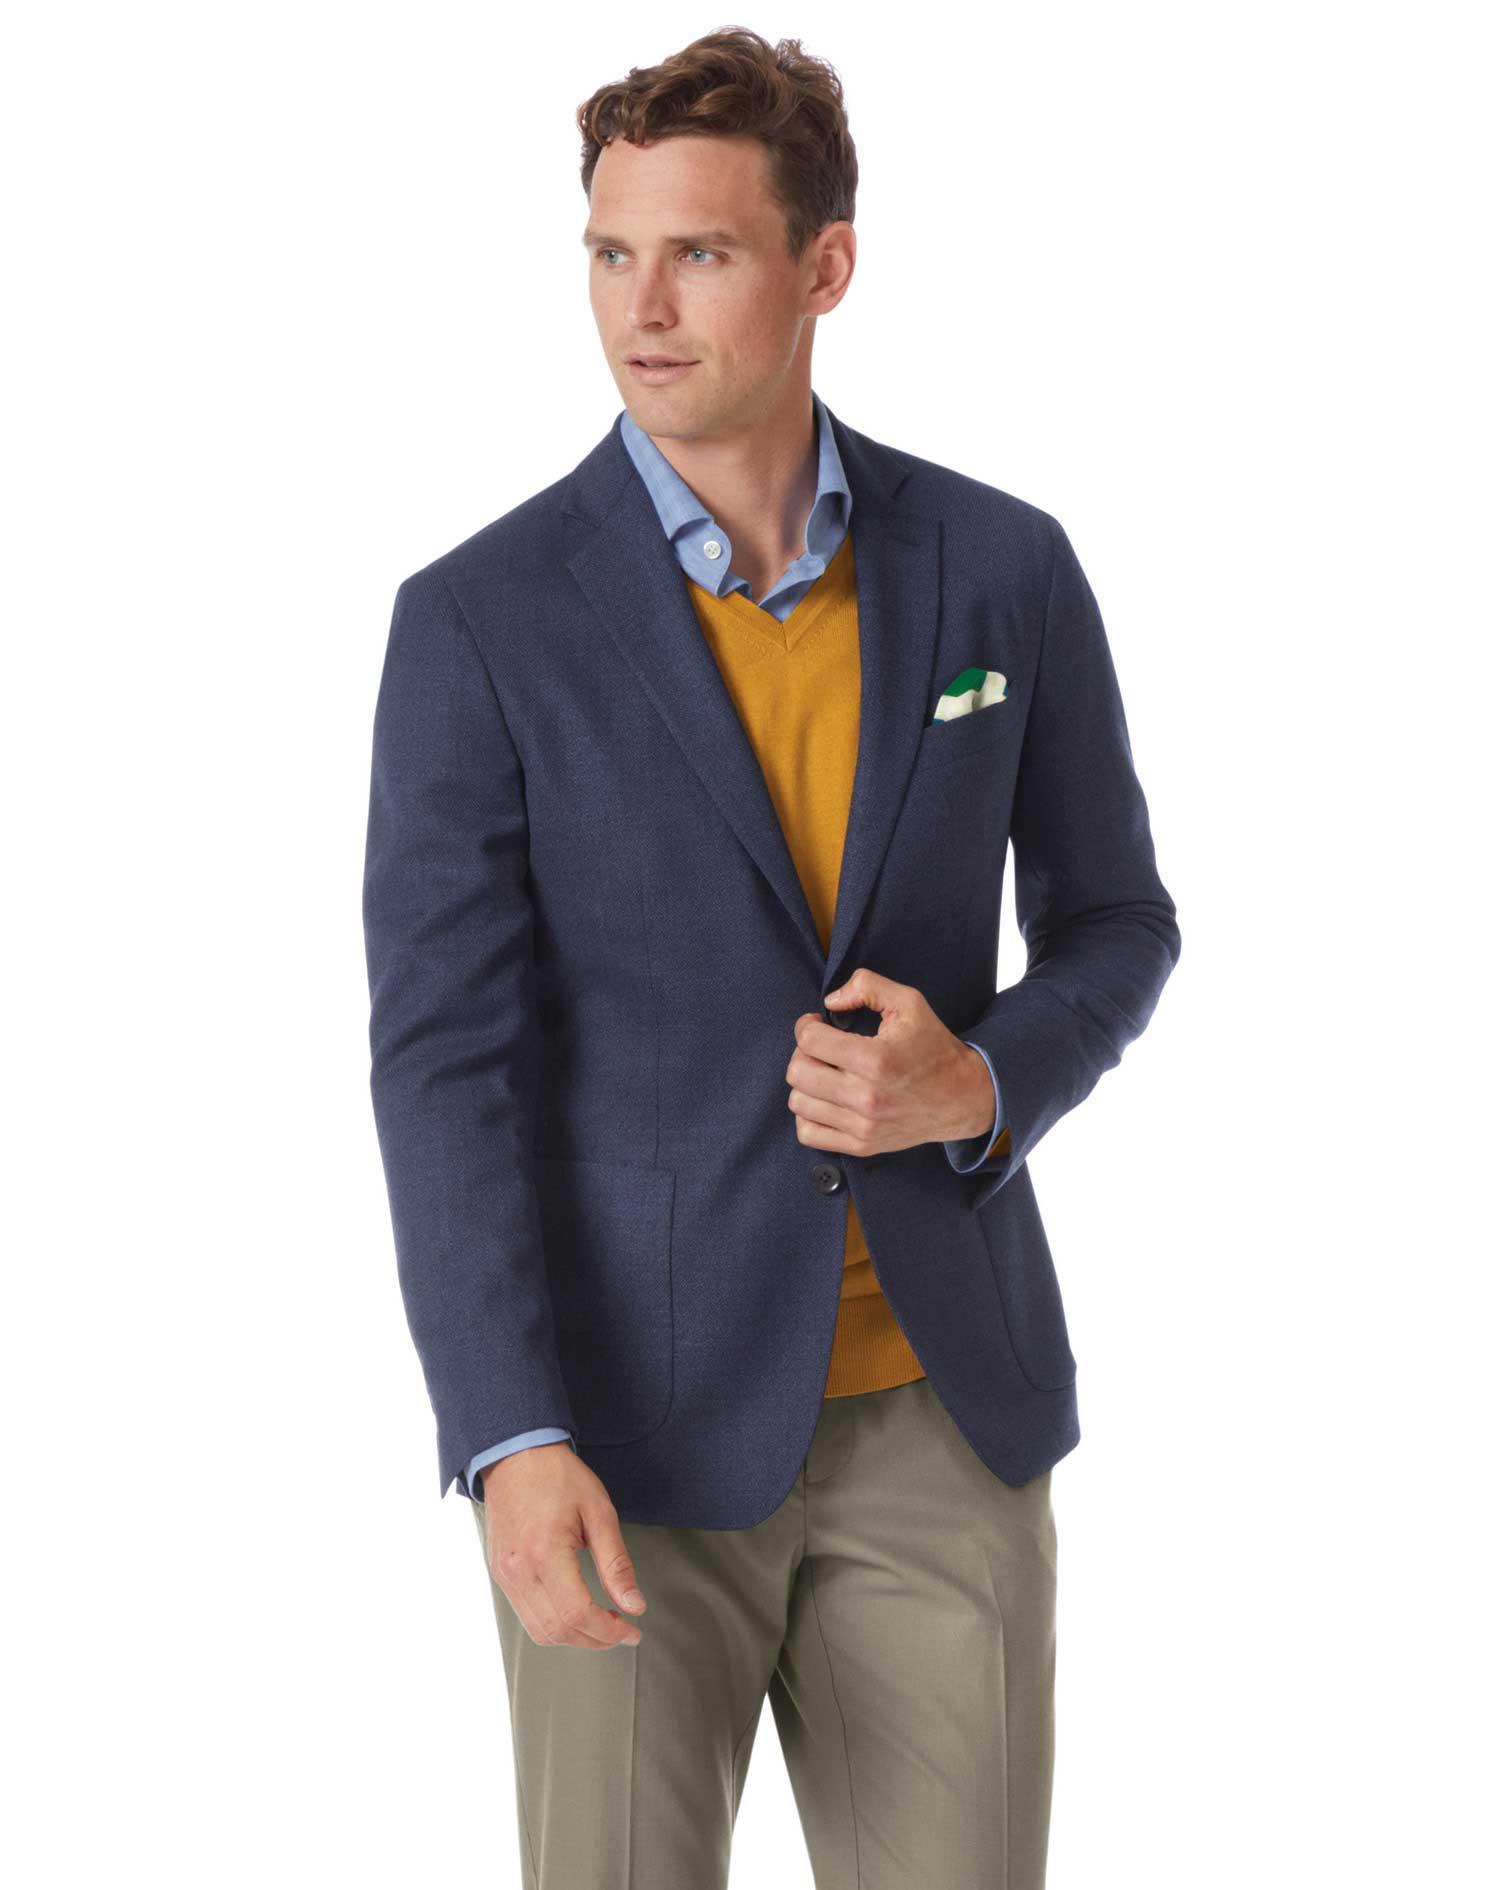 Slim Fit Indigo Blue Italian Wool Blazer Size 42 Long by Charles Tyrwhitt